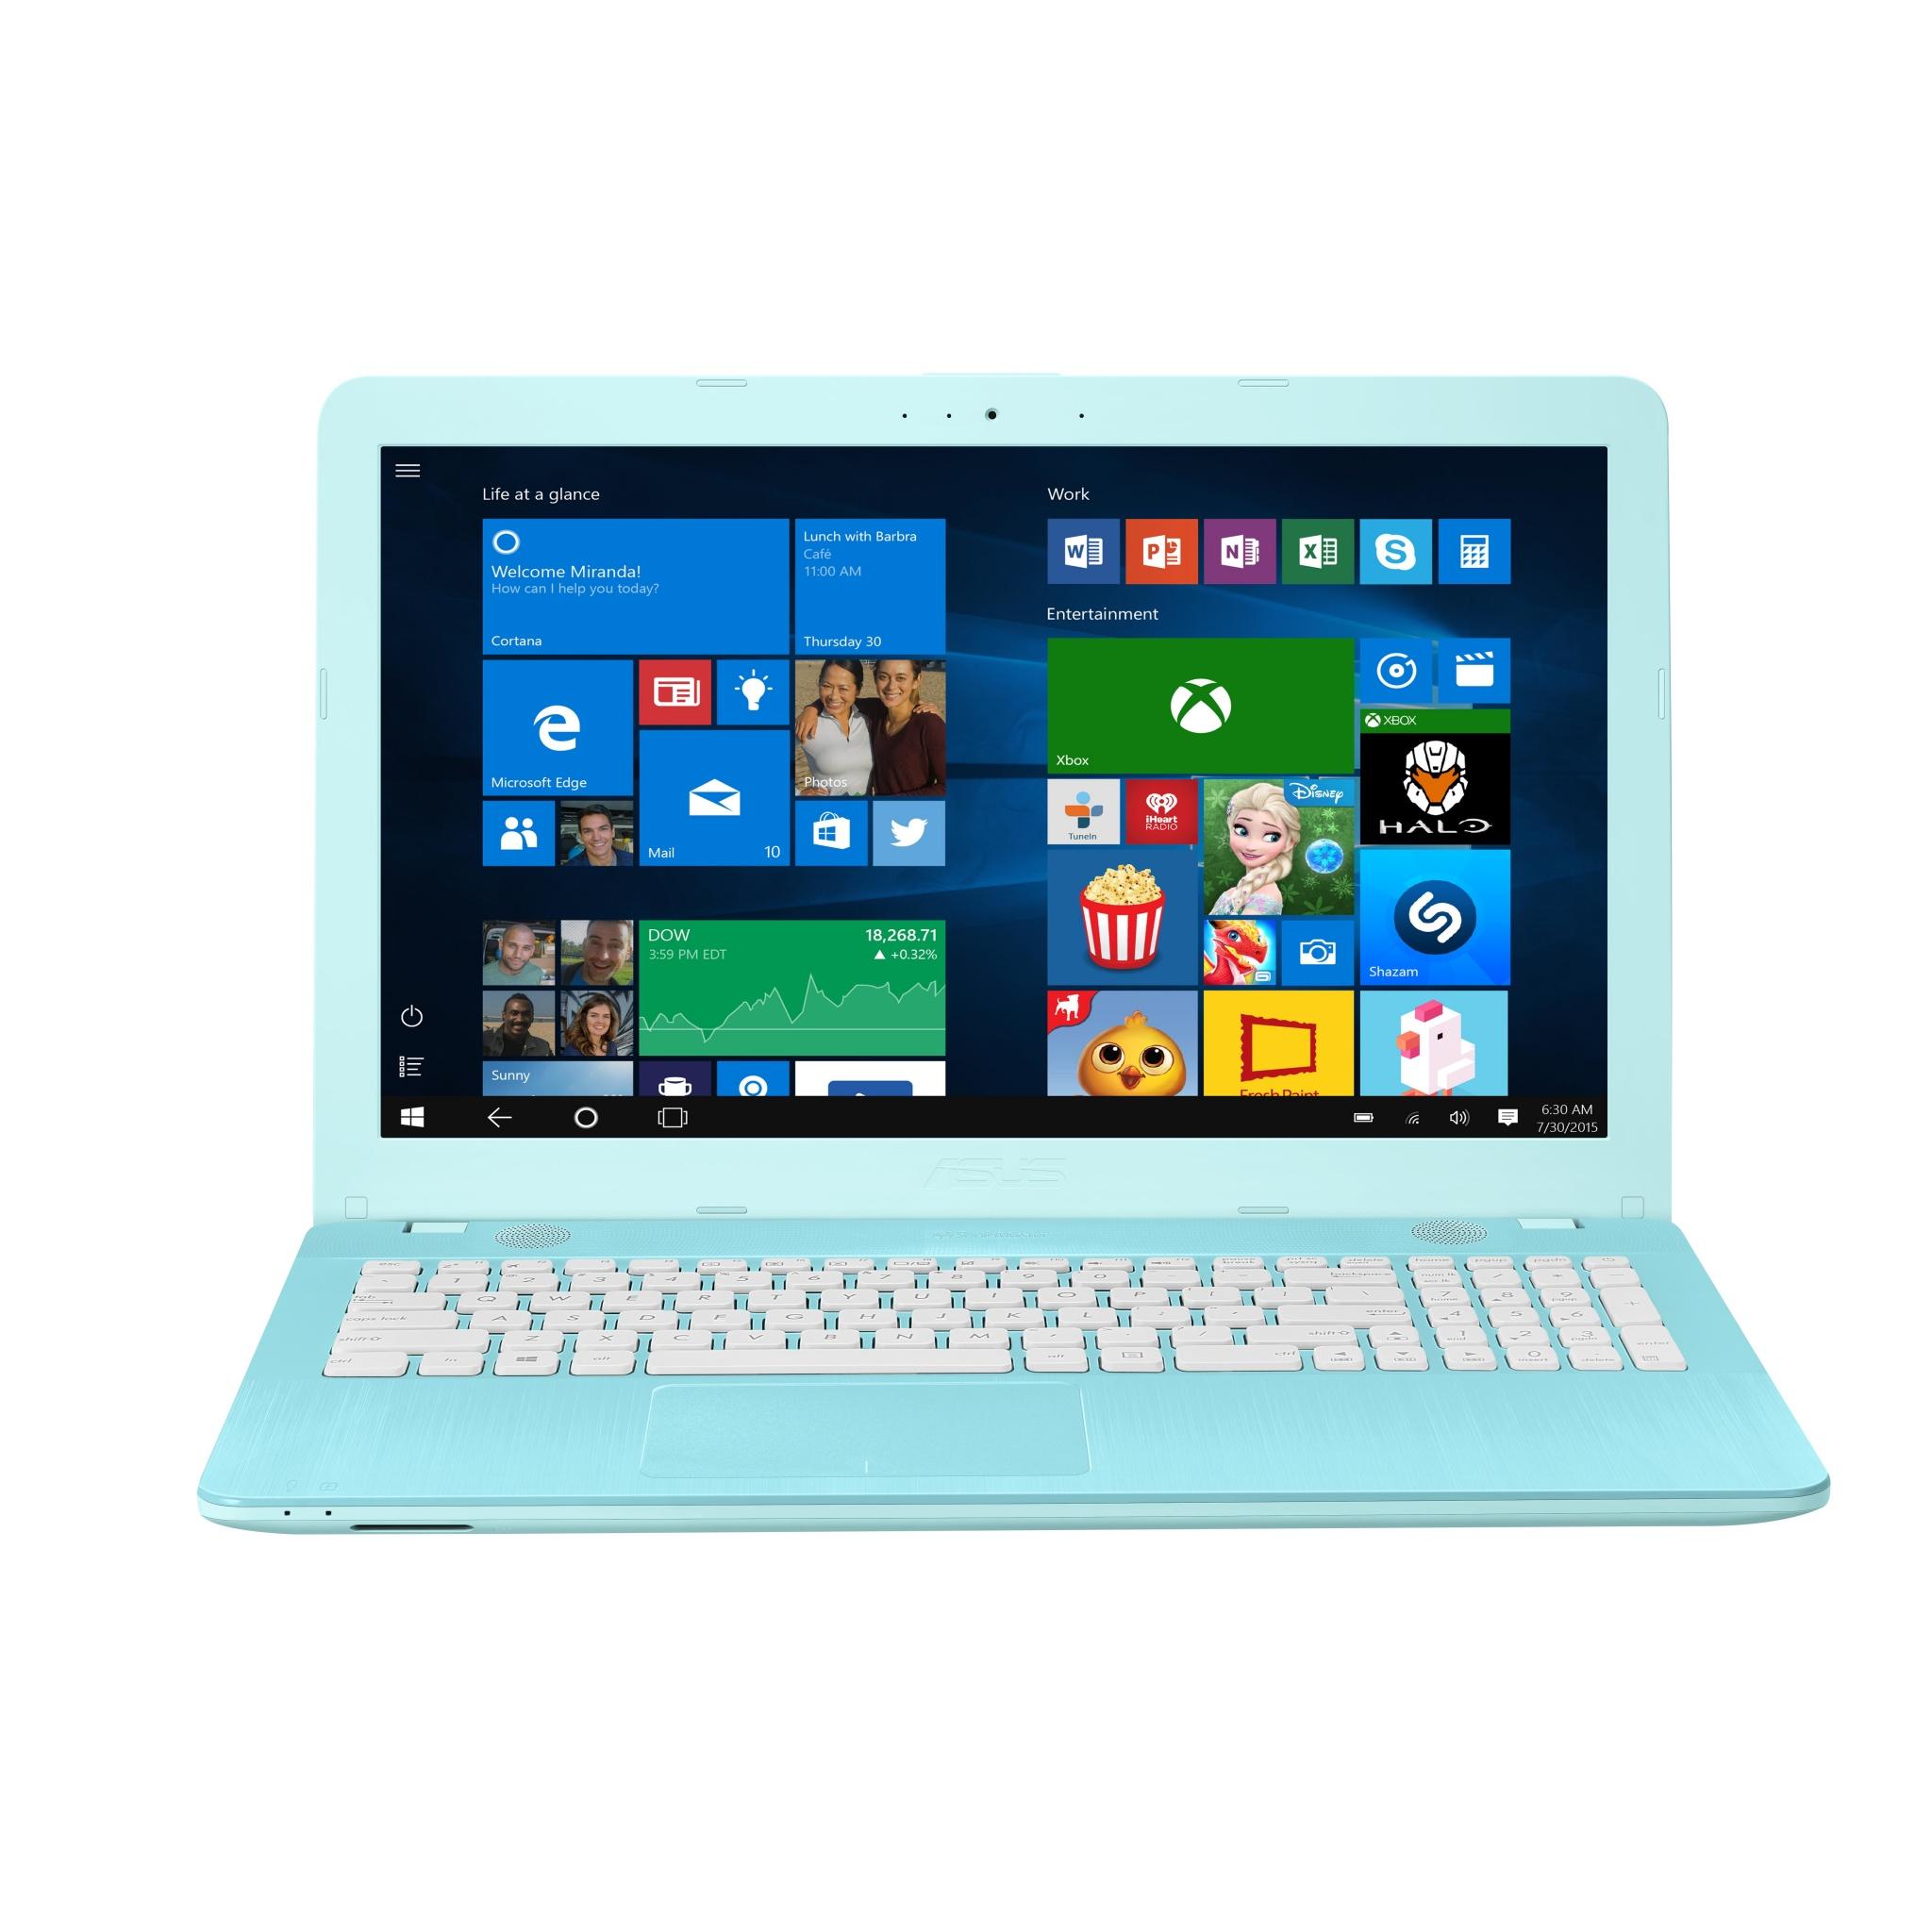 ASUS VivoBook Max X541SA-XX121T 1 6GHz N3710 15 6